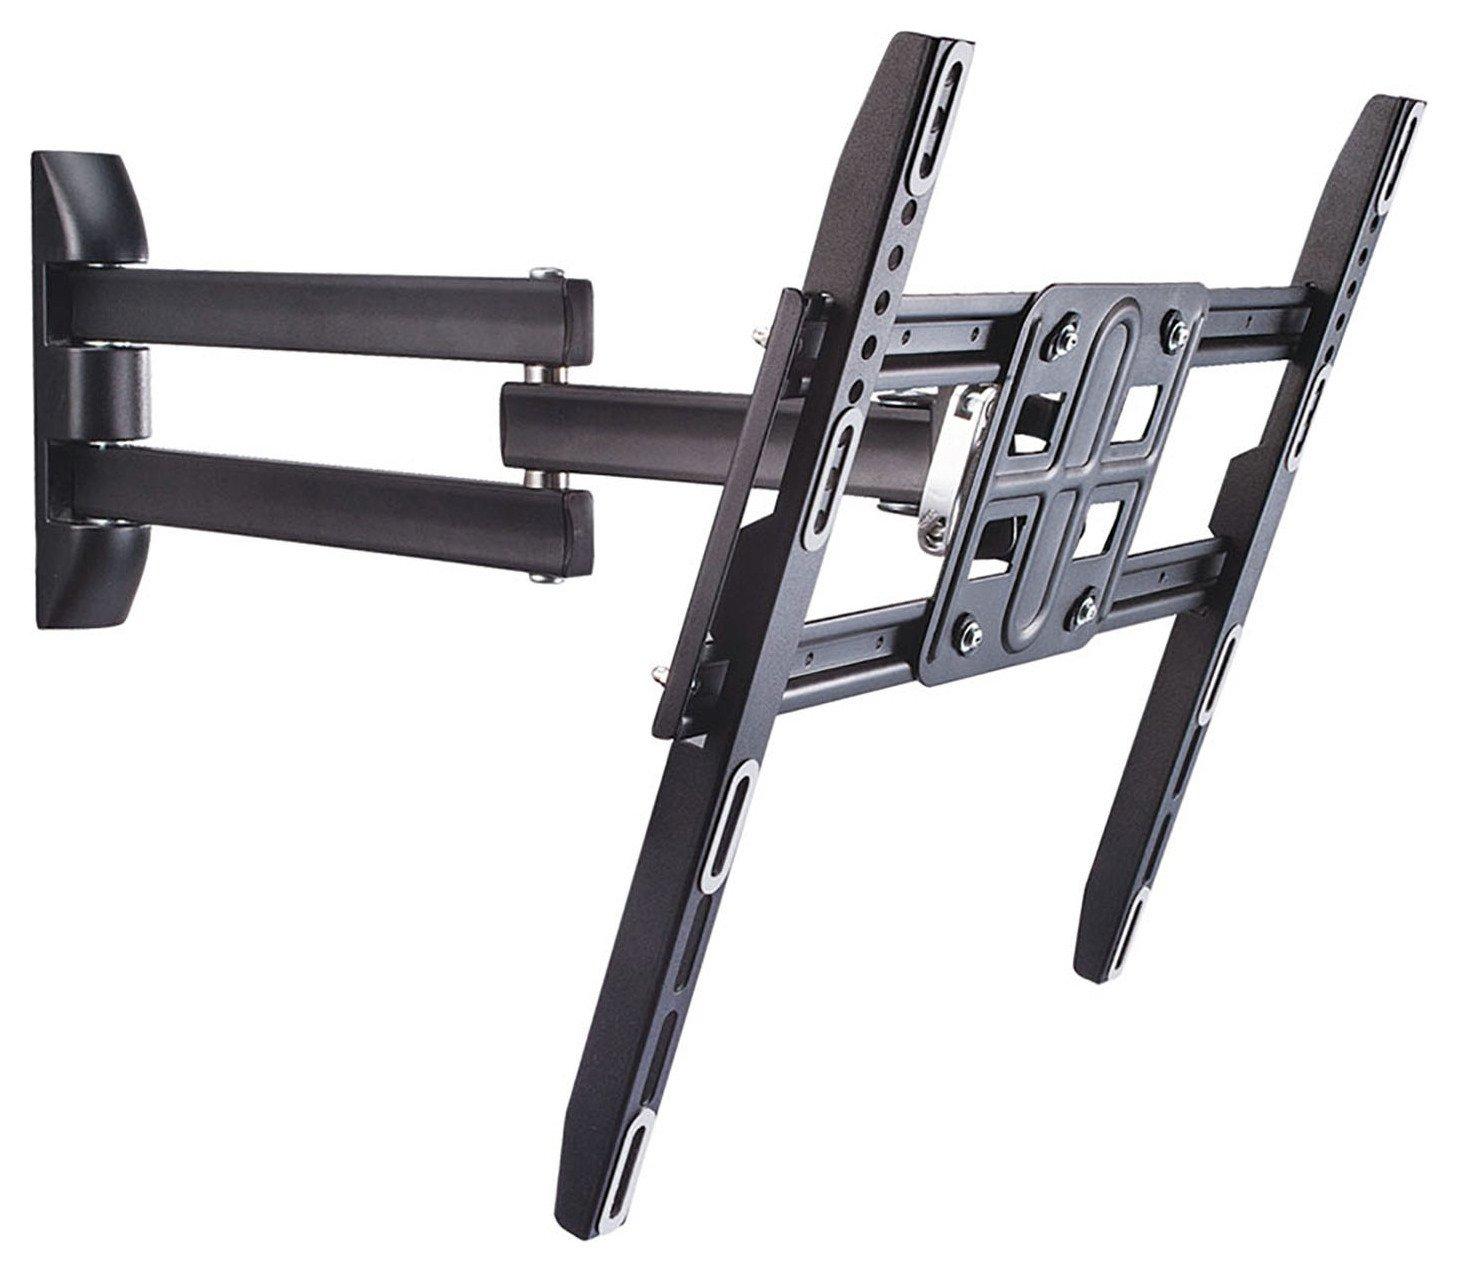 superior-multi-position-32-70-inch-tv-wall-bracket